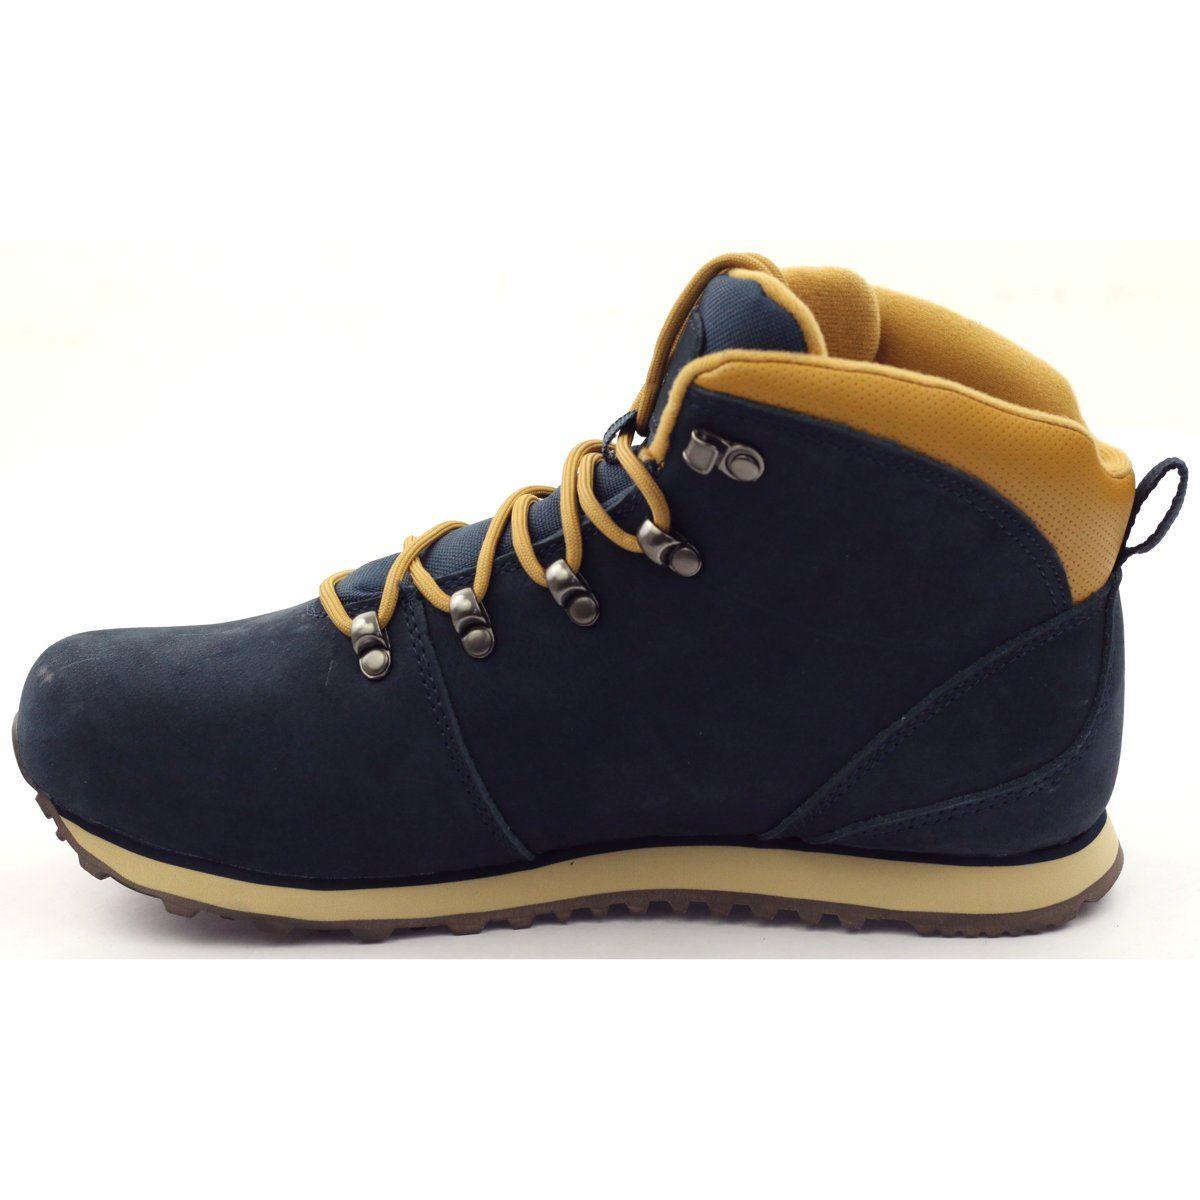 Mckey Trekkingowe Sportowe Membrana 419 Zolte Granatowe Hiking Boots Shoes Boots